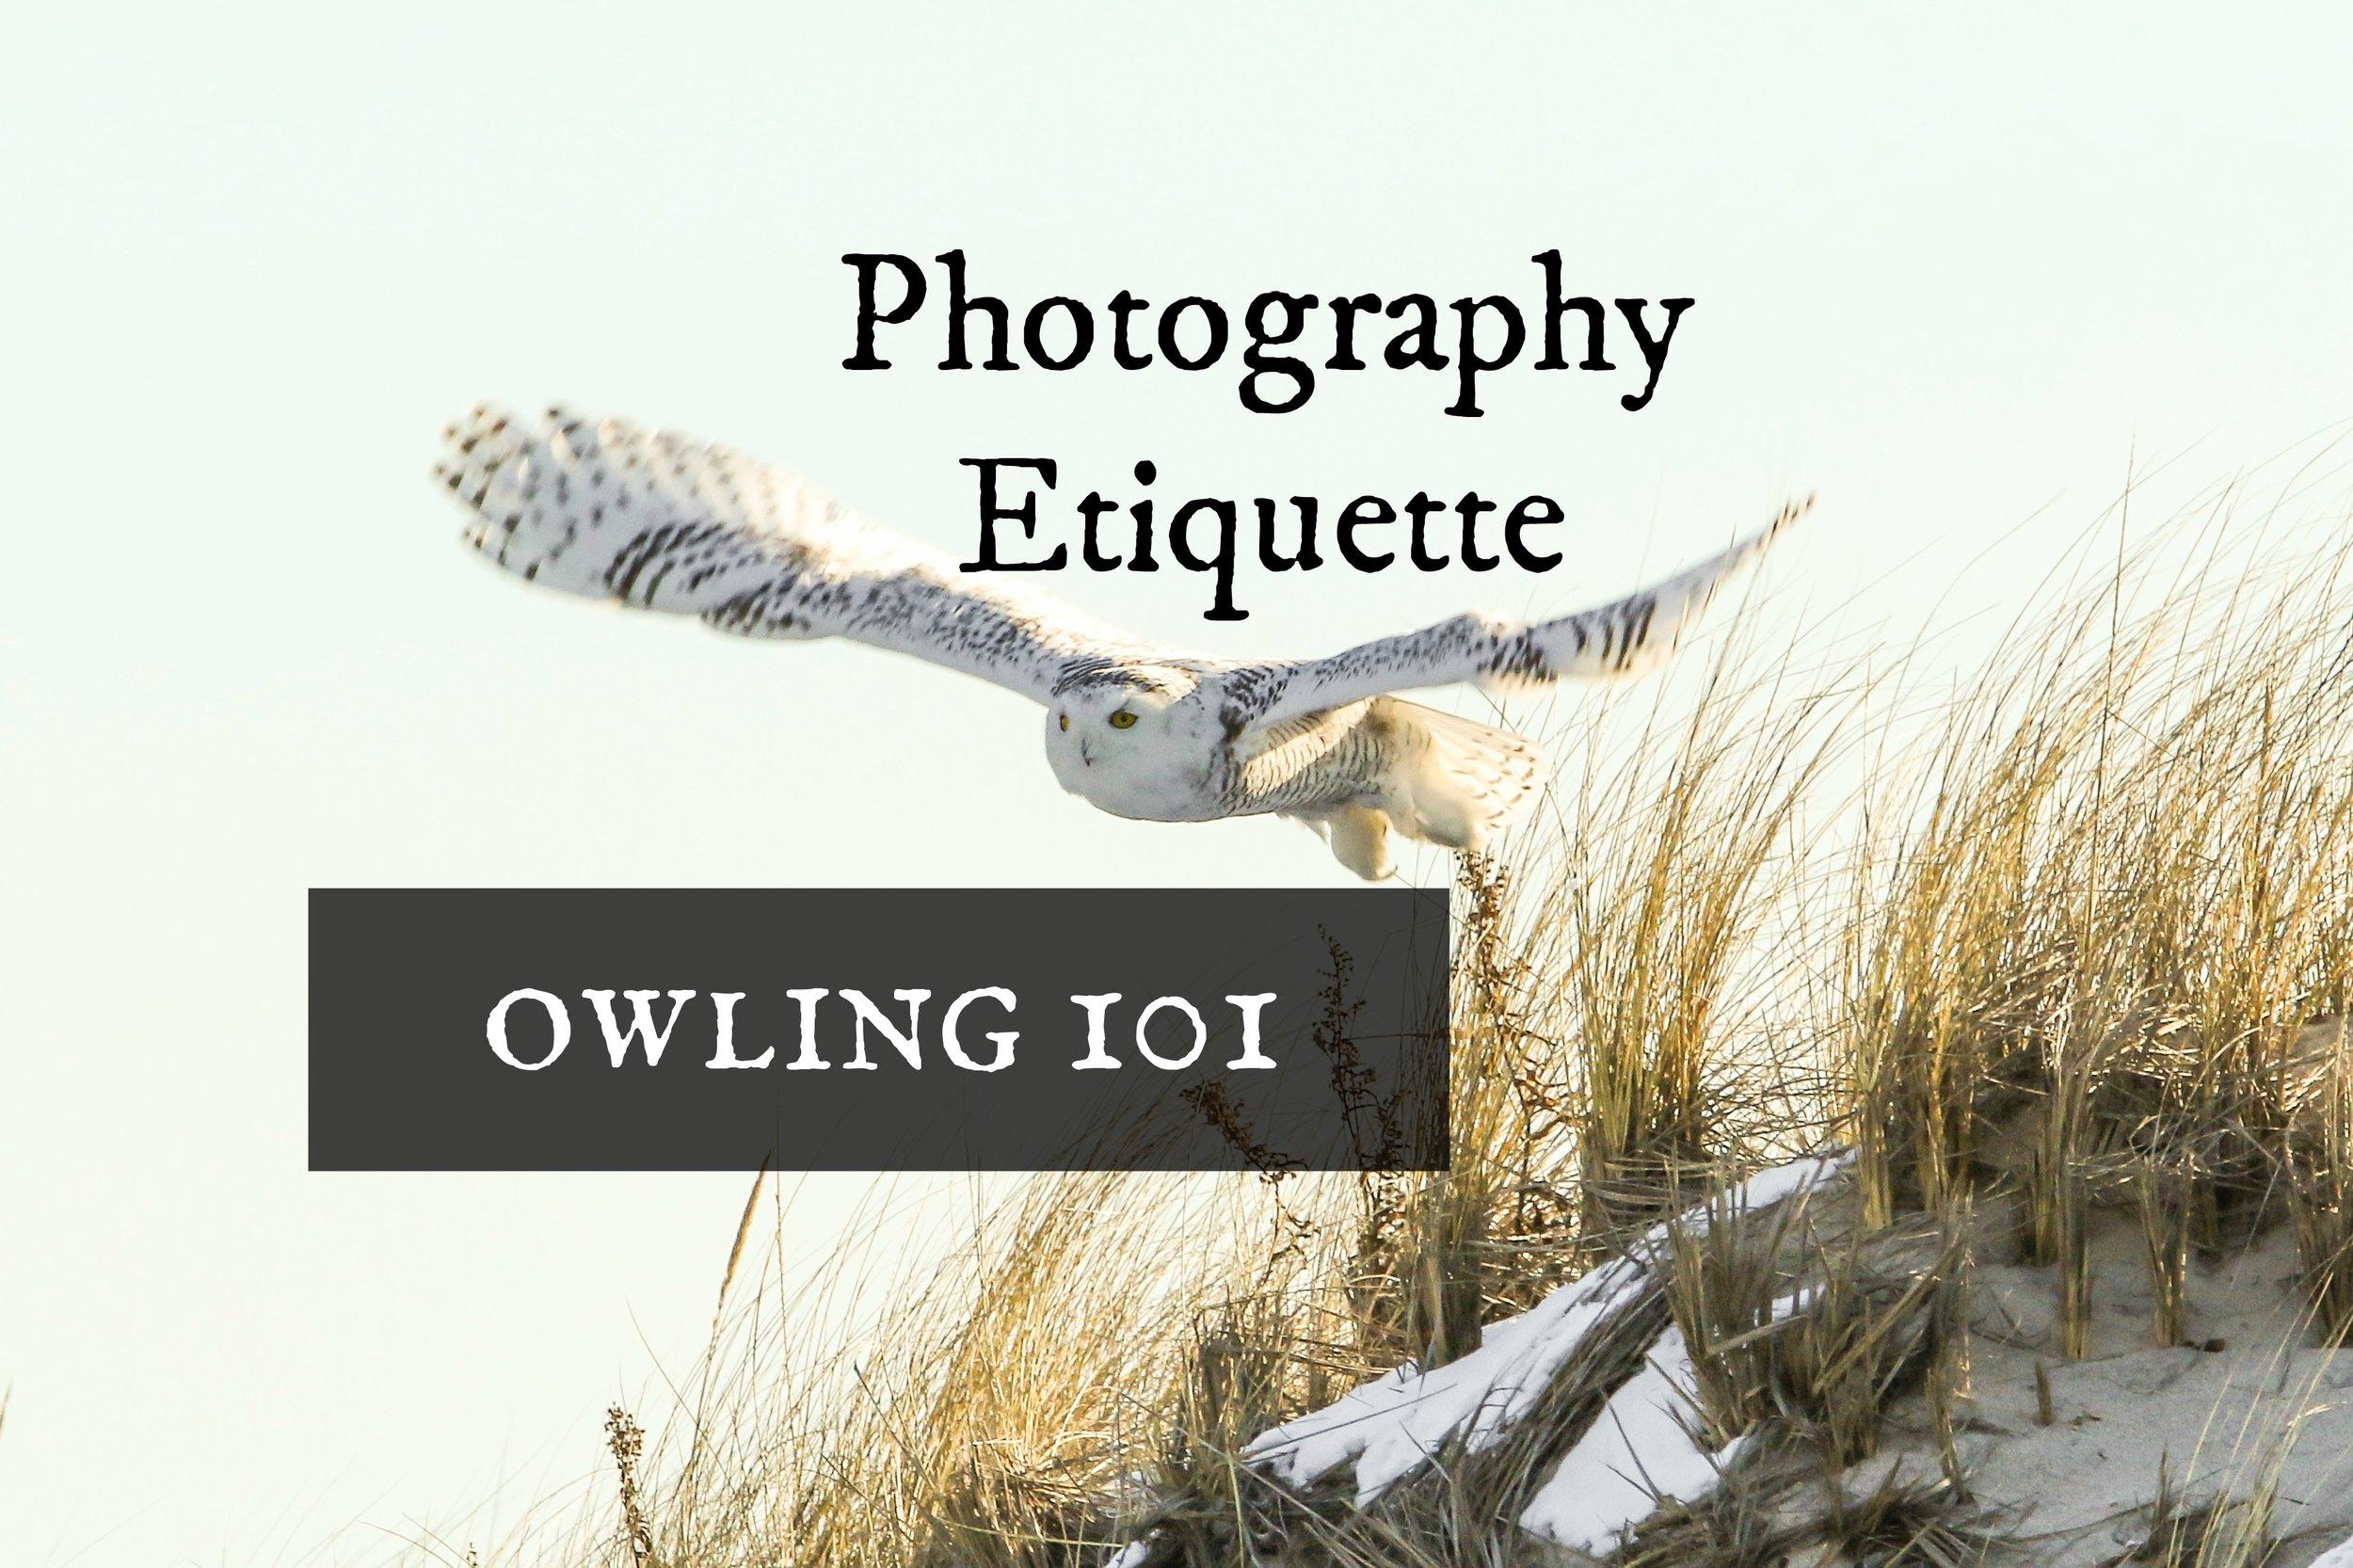 owling101-paparazzi.jpg